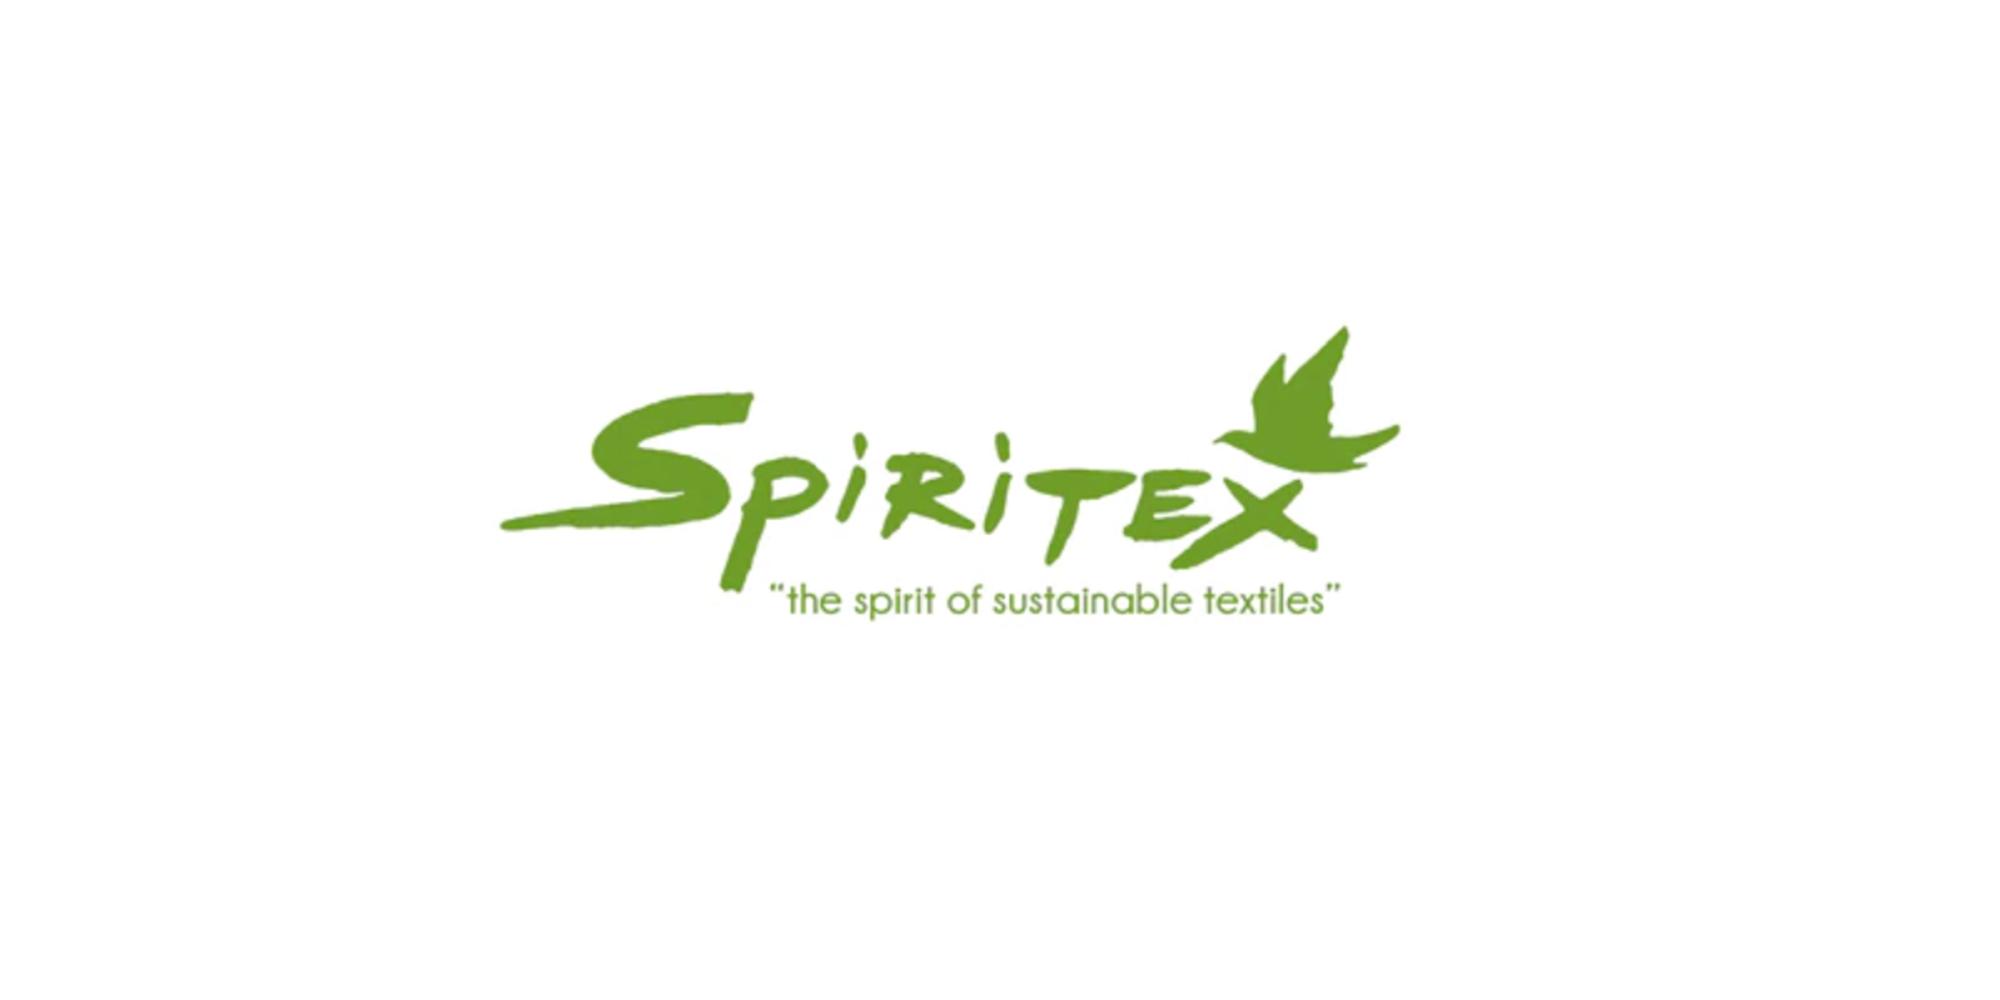 SpiritexLogo.jpg